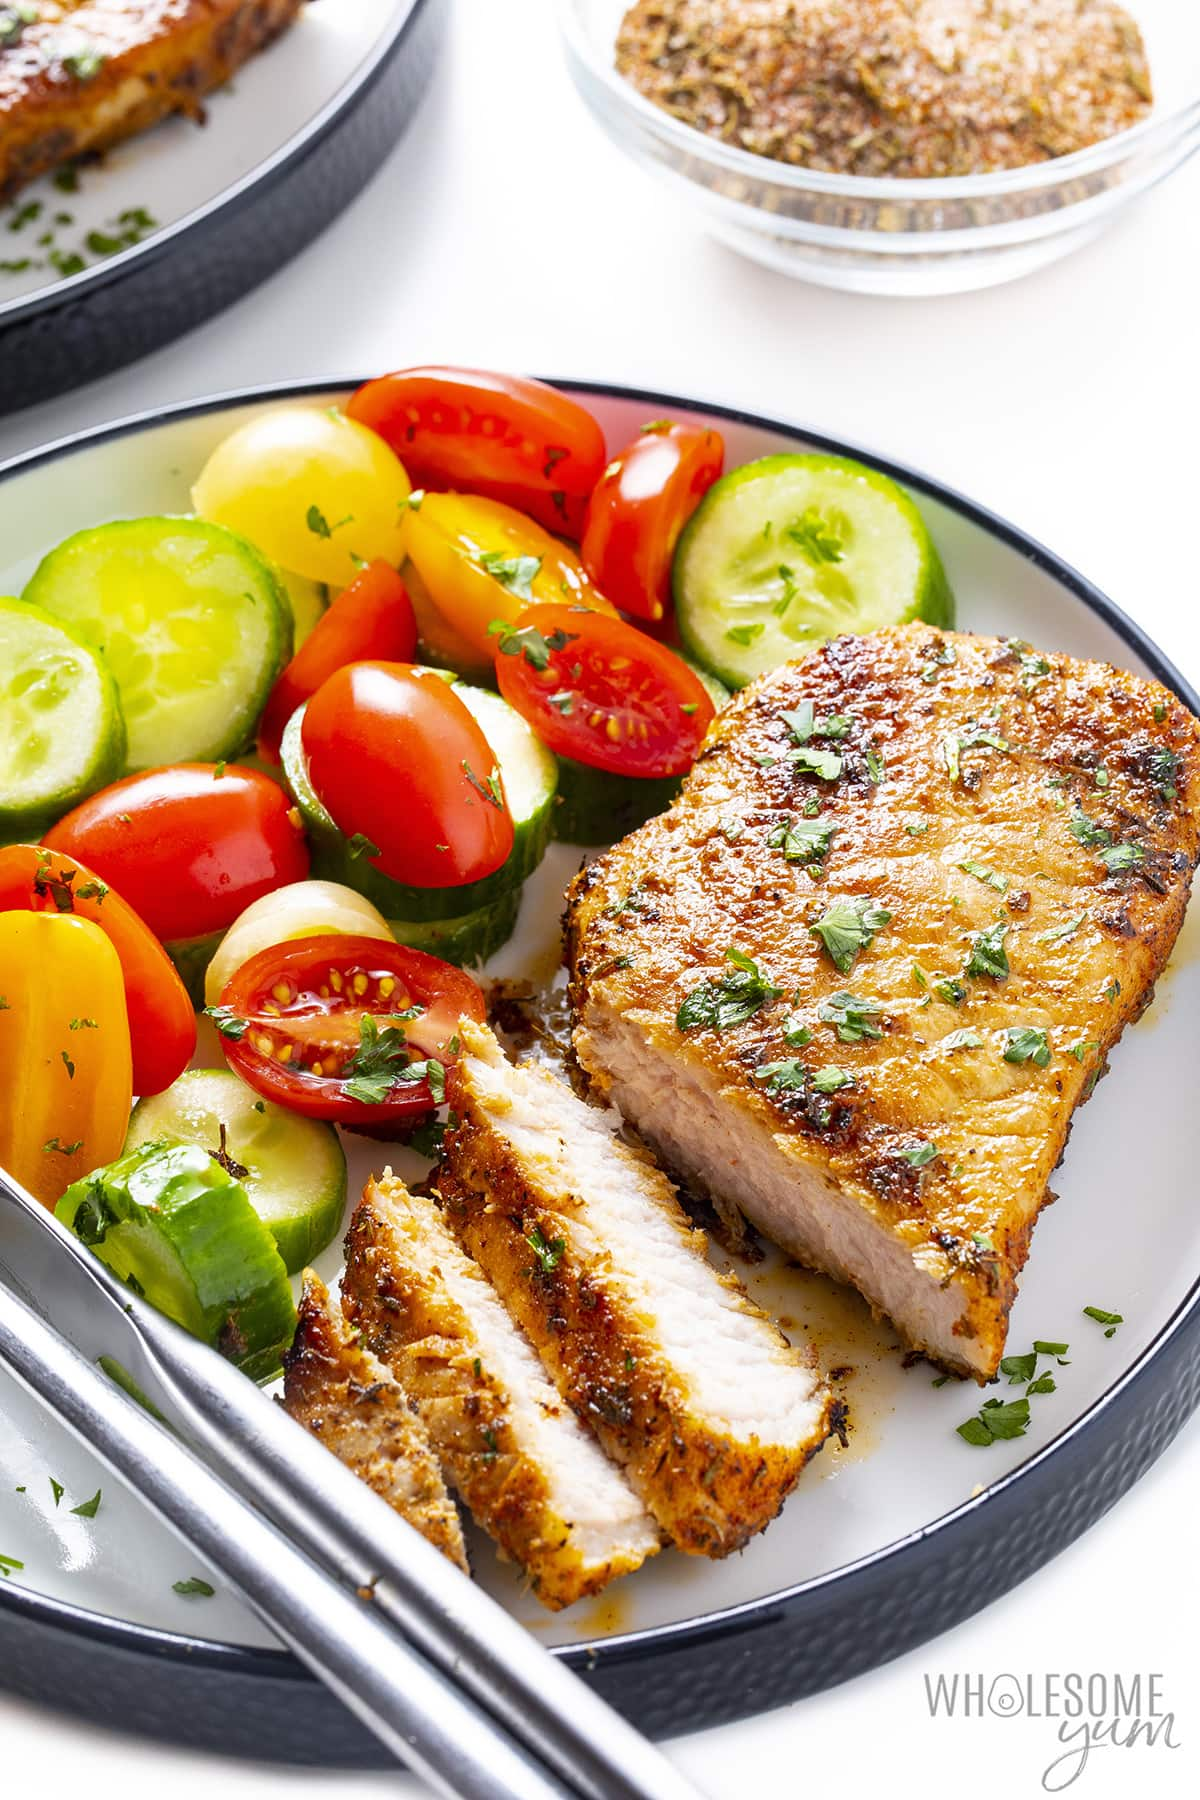 Pork chop with pork chop seasoning and veggies